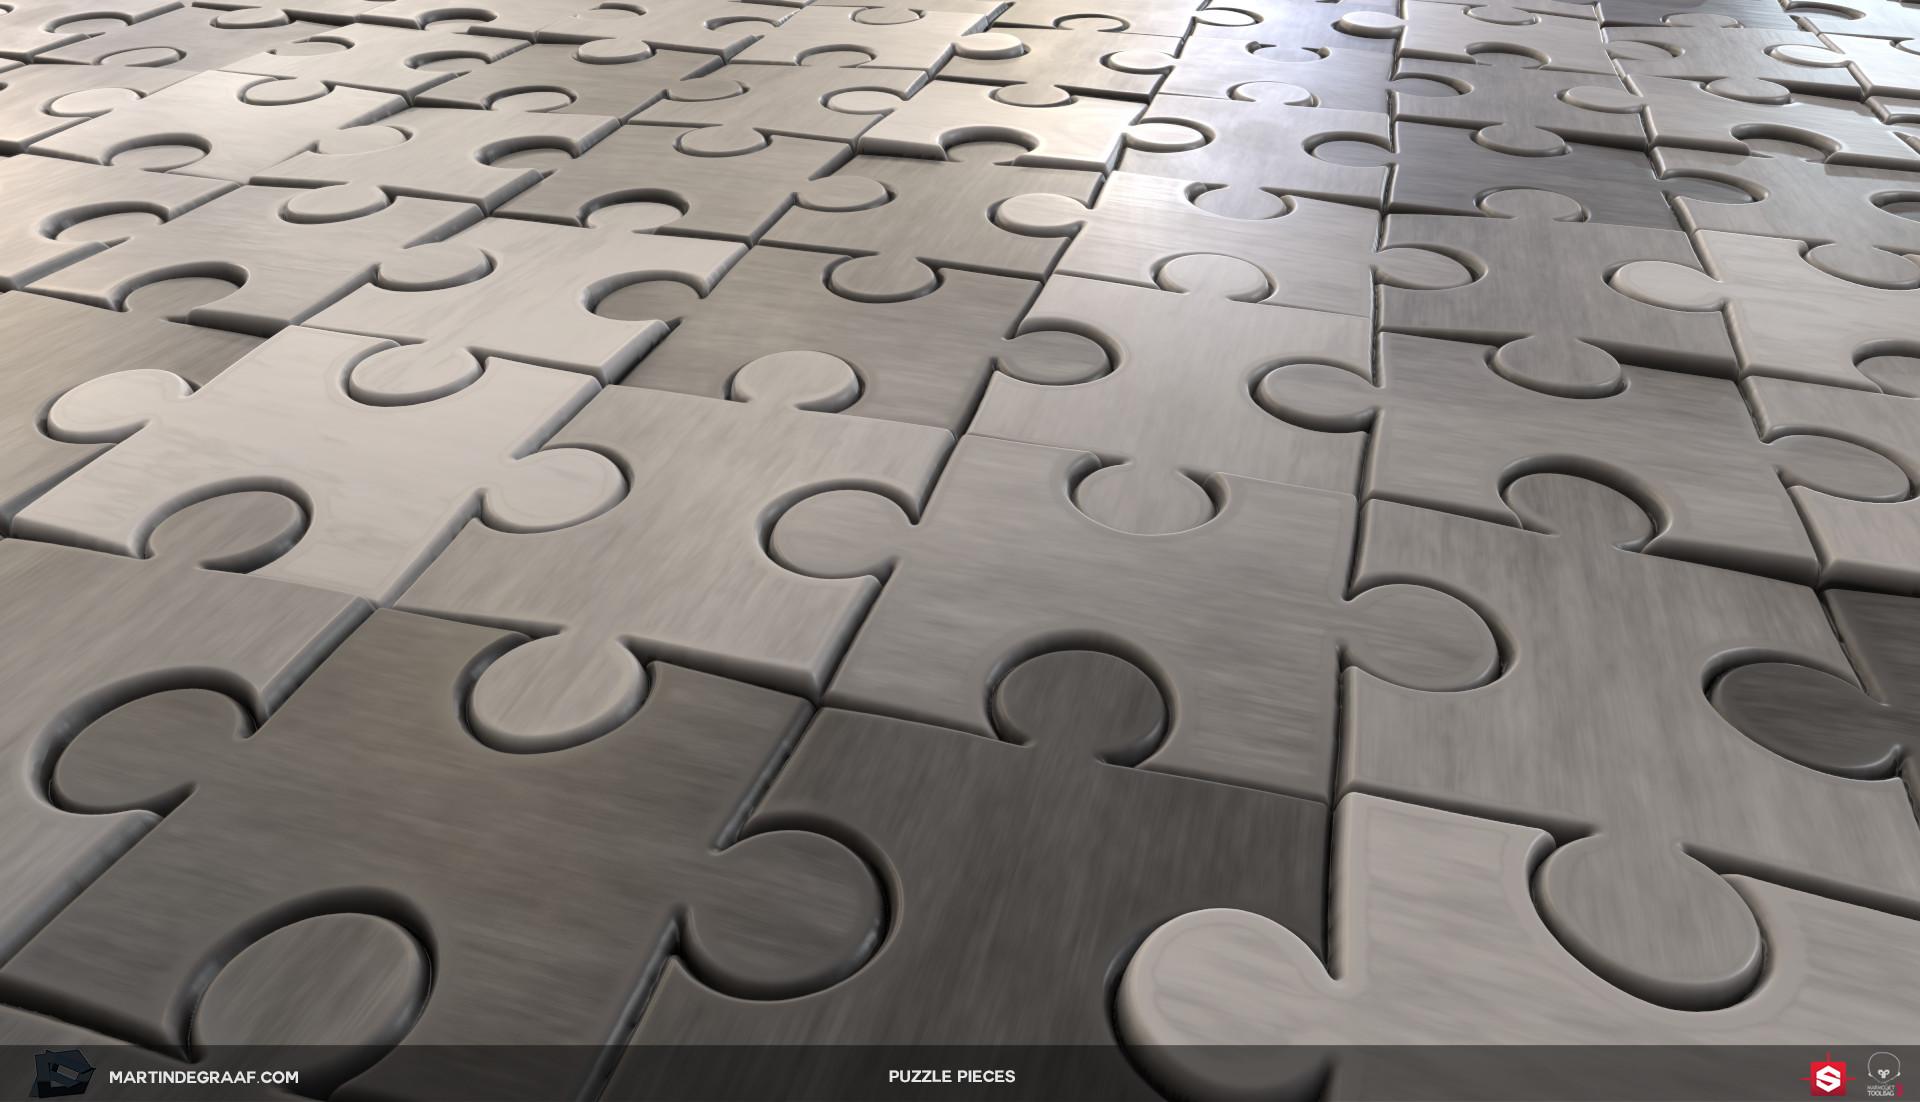 Martin de graaf puzzle pieces substance plane martin de graaf 2018